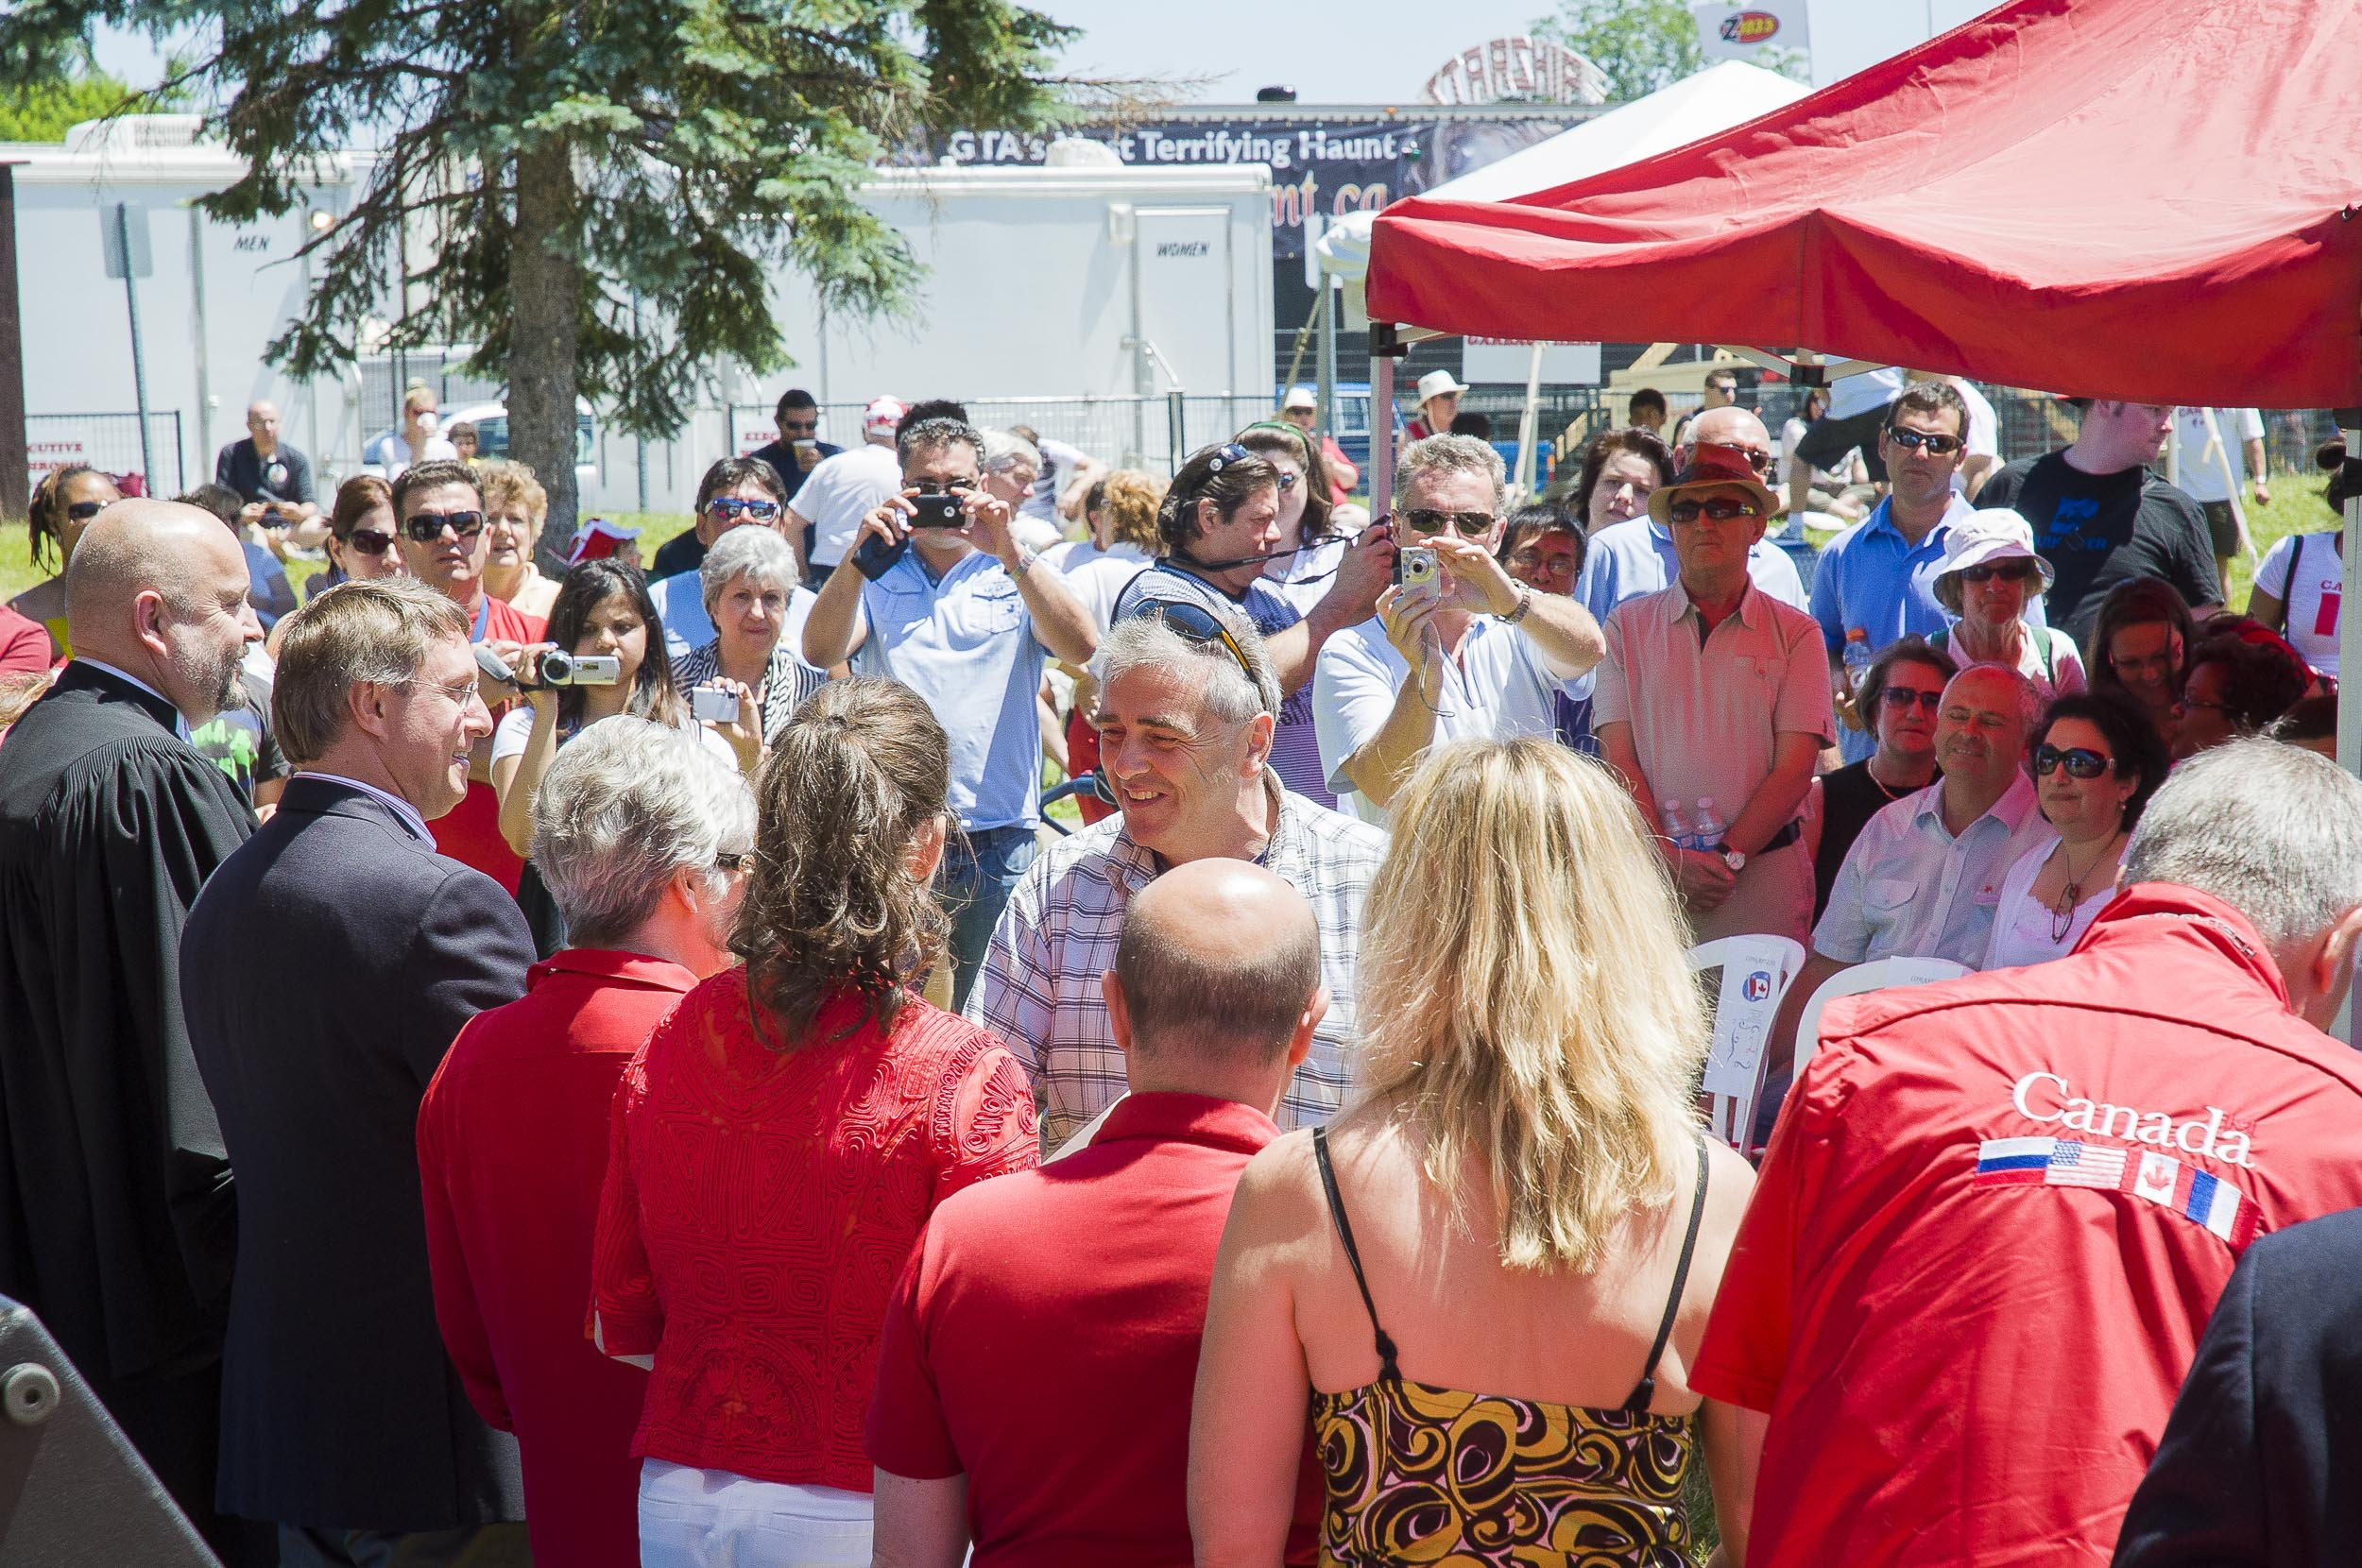 Canadian Citizenship Ceremony-Ribfest -758157099.jpg